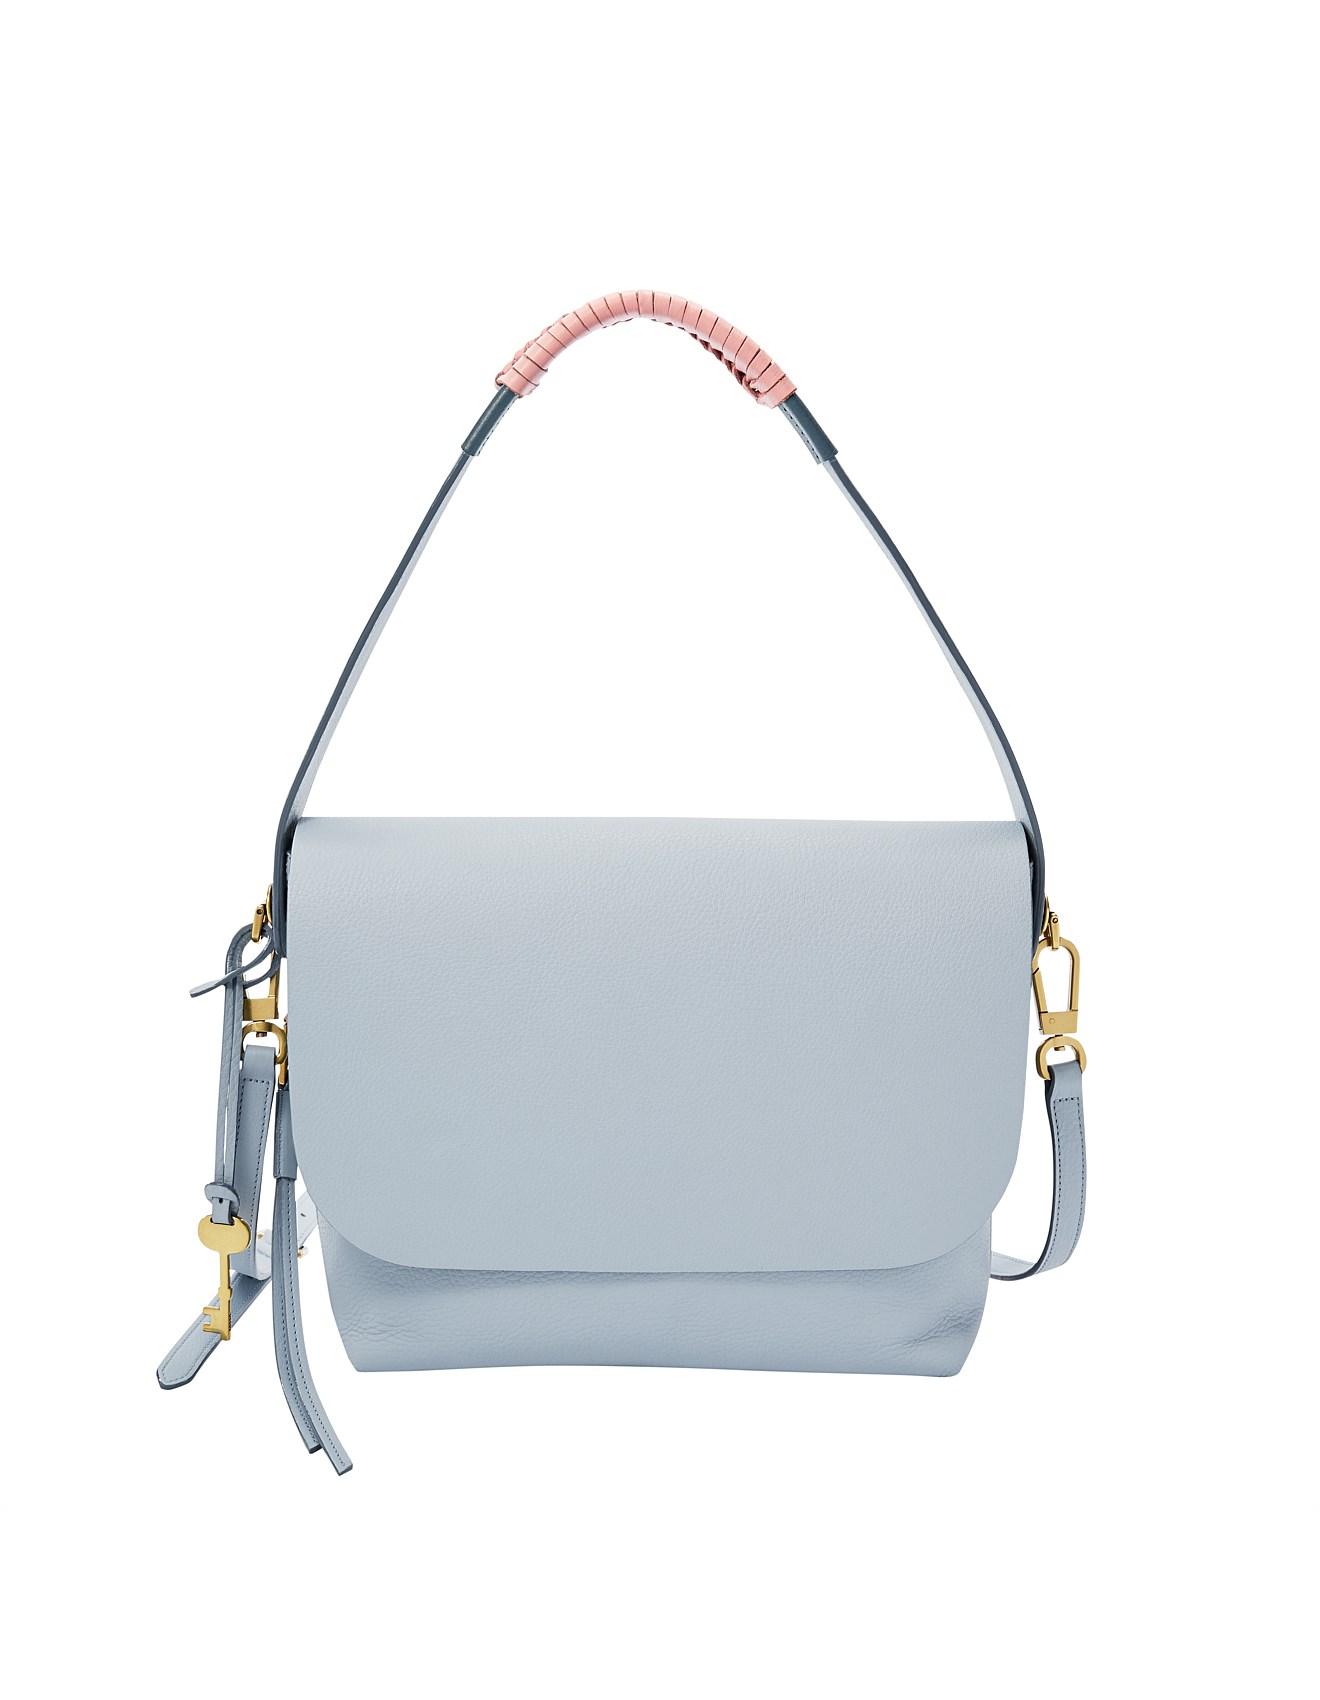 8771267ec Bags & Accessories - Maya Crossbody